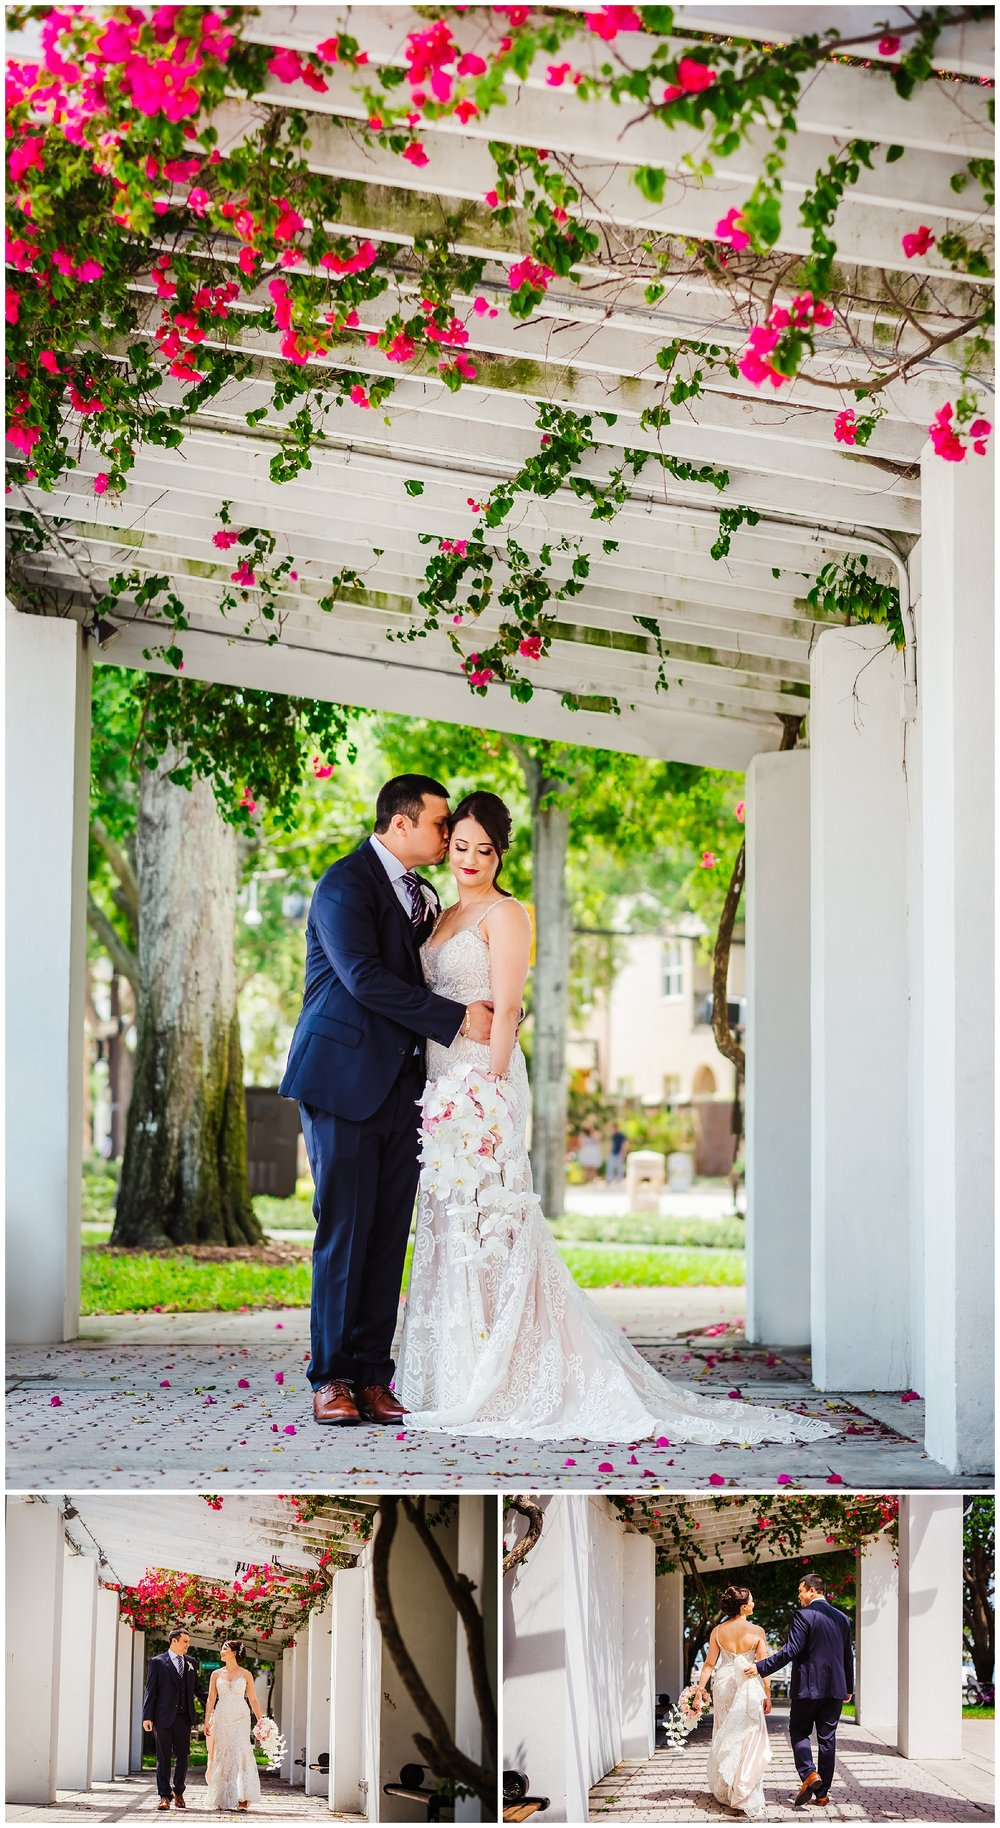 vinoy-sunset-ballroom-rainy-day-wedding-photography-orchids-trinidad-flawless-fetes-ashlee-hamon_0108.jpg